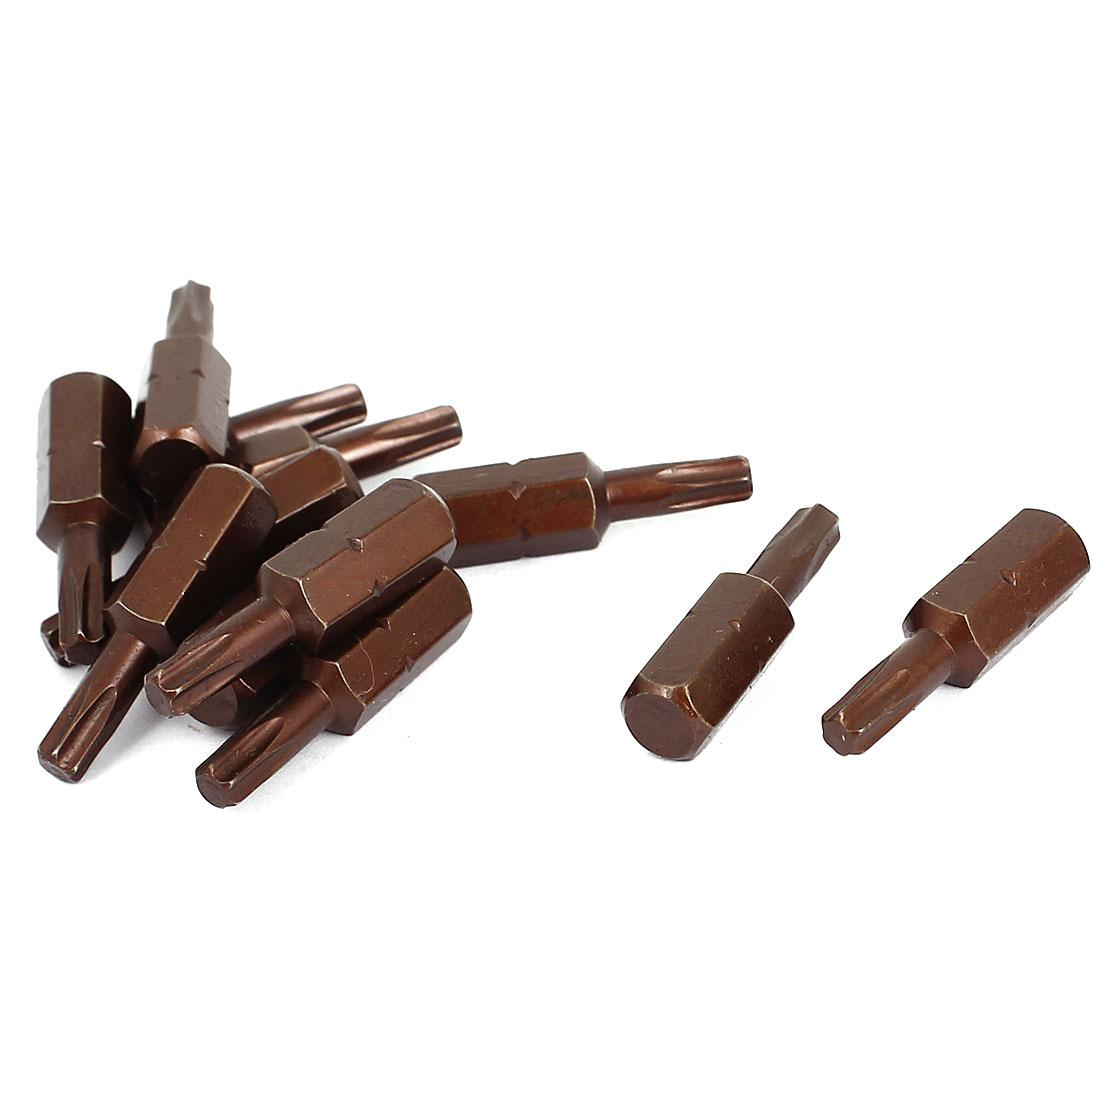 "25mm Length 1/4"" Hex Shank T20 Magnetic Tip Torx Screwdriver Bits 12 Pcs"